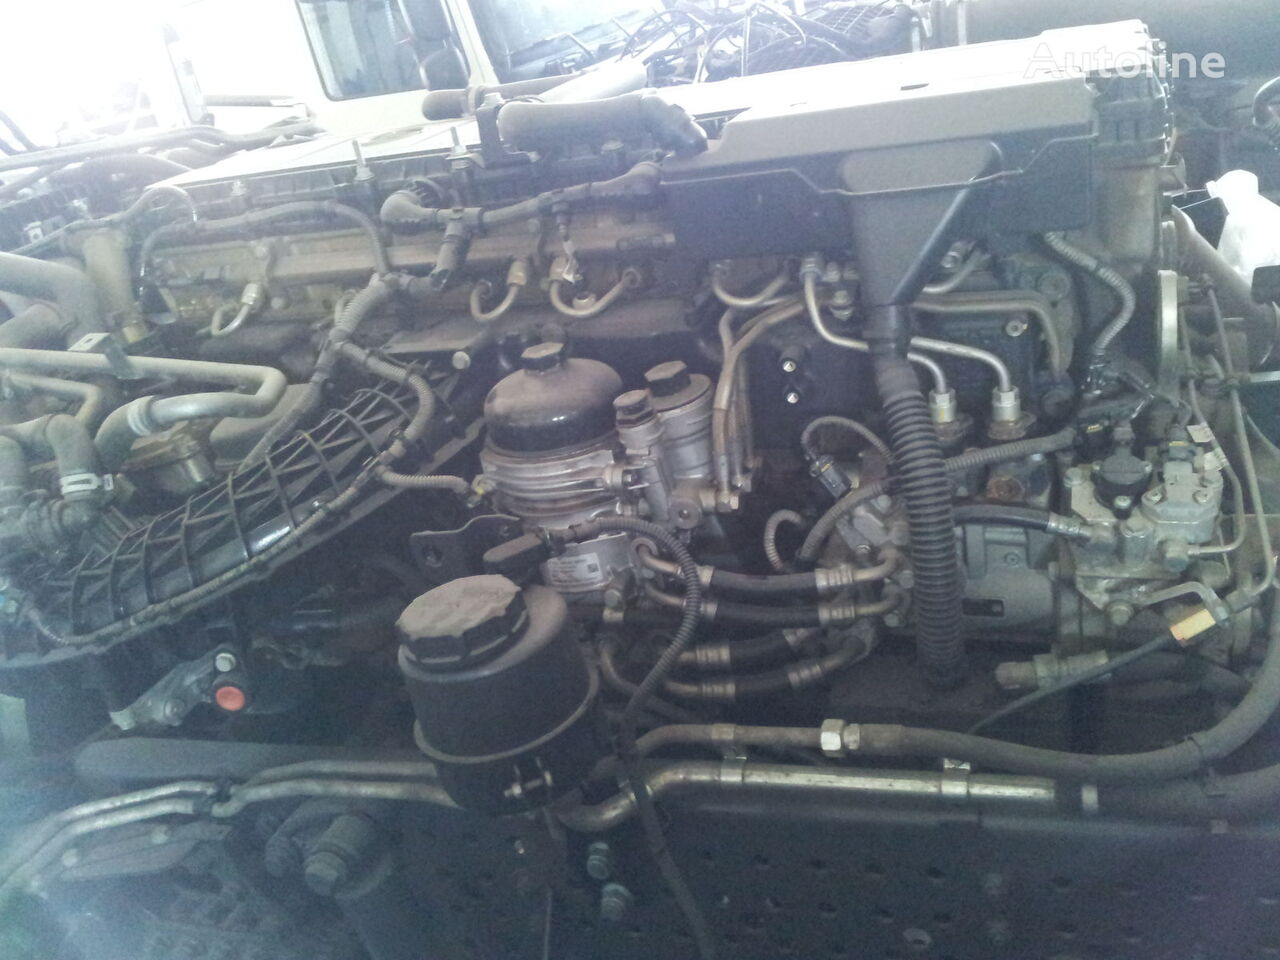 MERCEDES-BENZ Actros MP4, EURO5, EURO6 engine OM470LA, OM471LA, 002106500 engine for MERCEDES-BENZ Actros MP4 EURO5, EURO6 truck